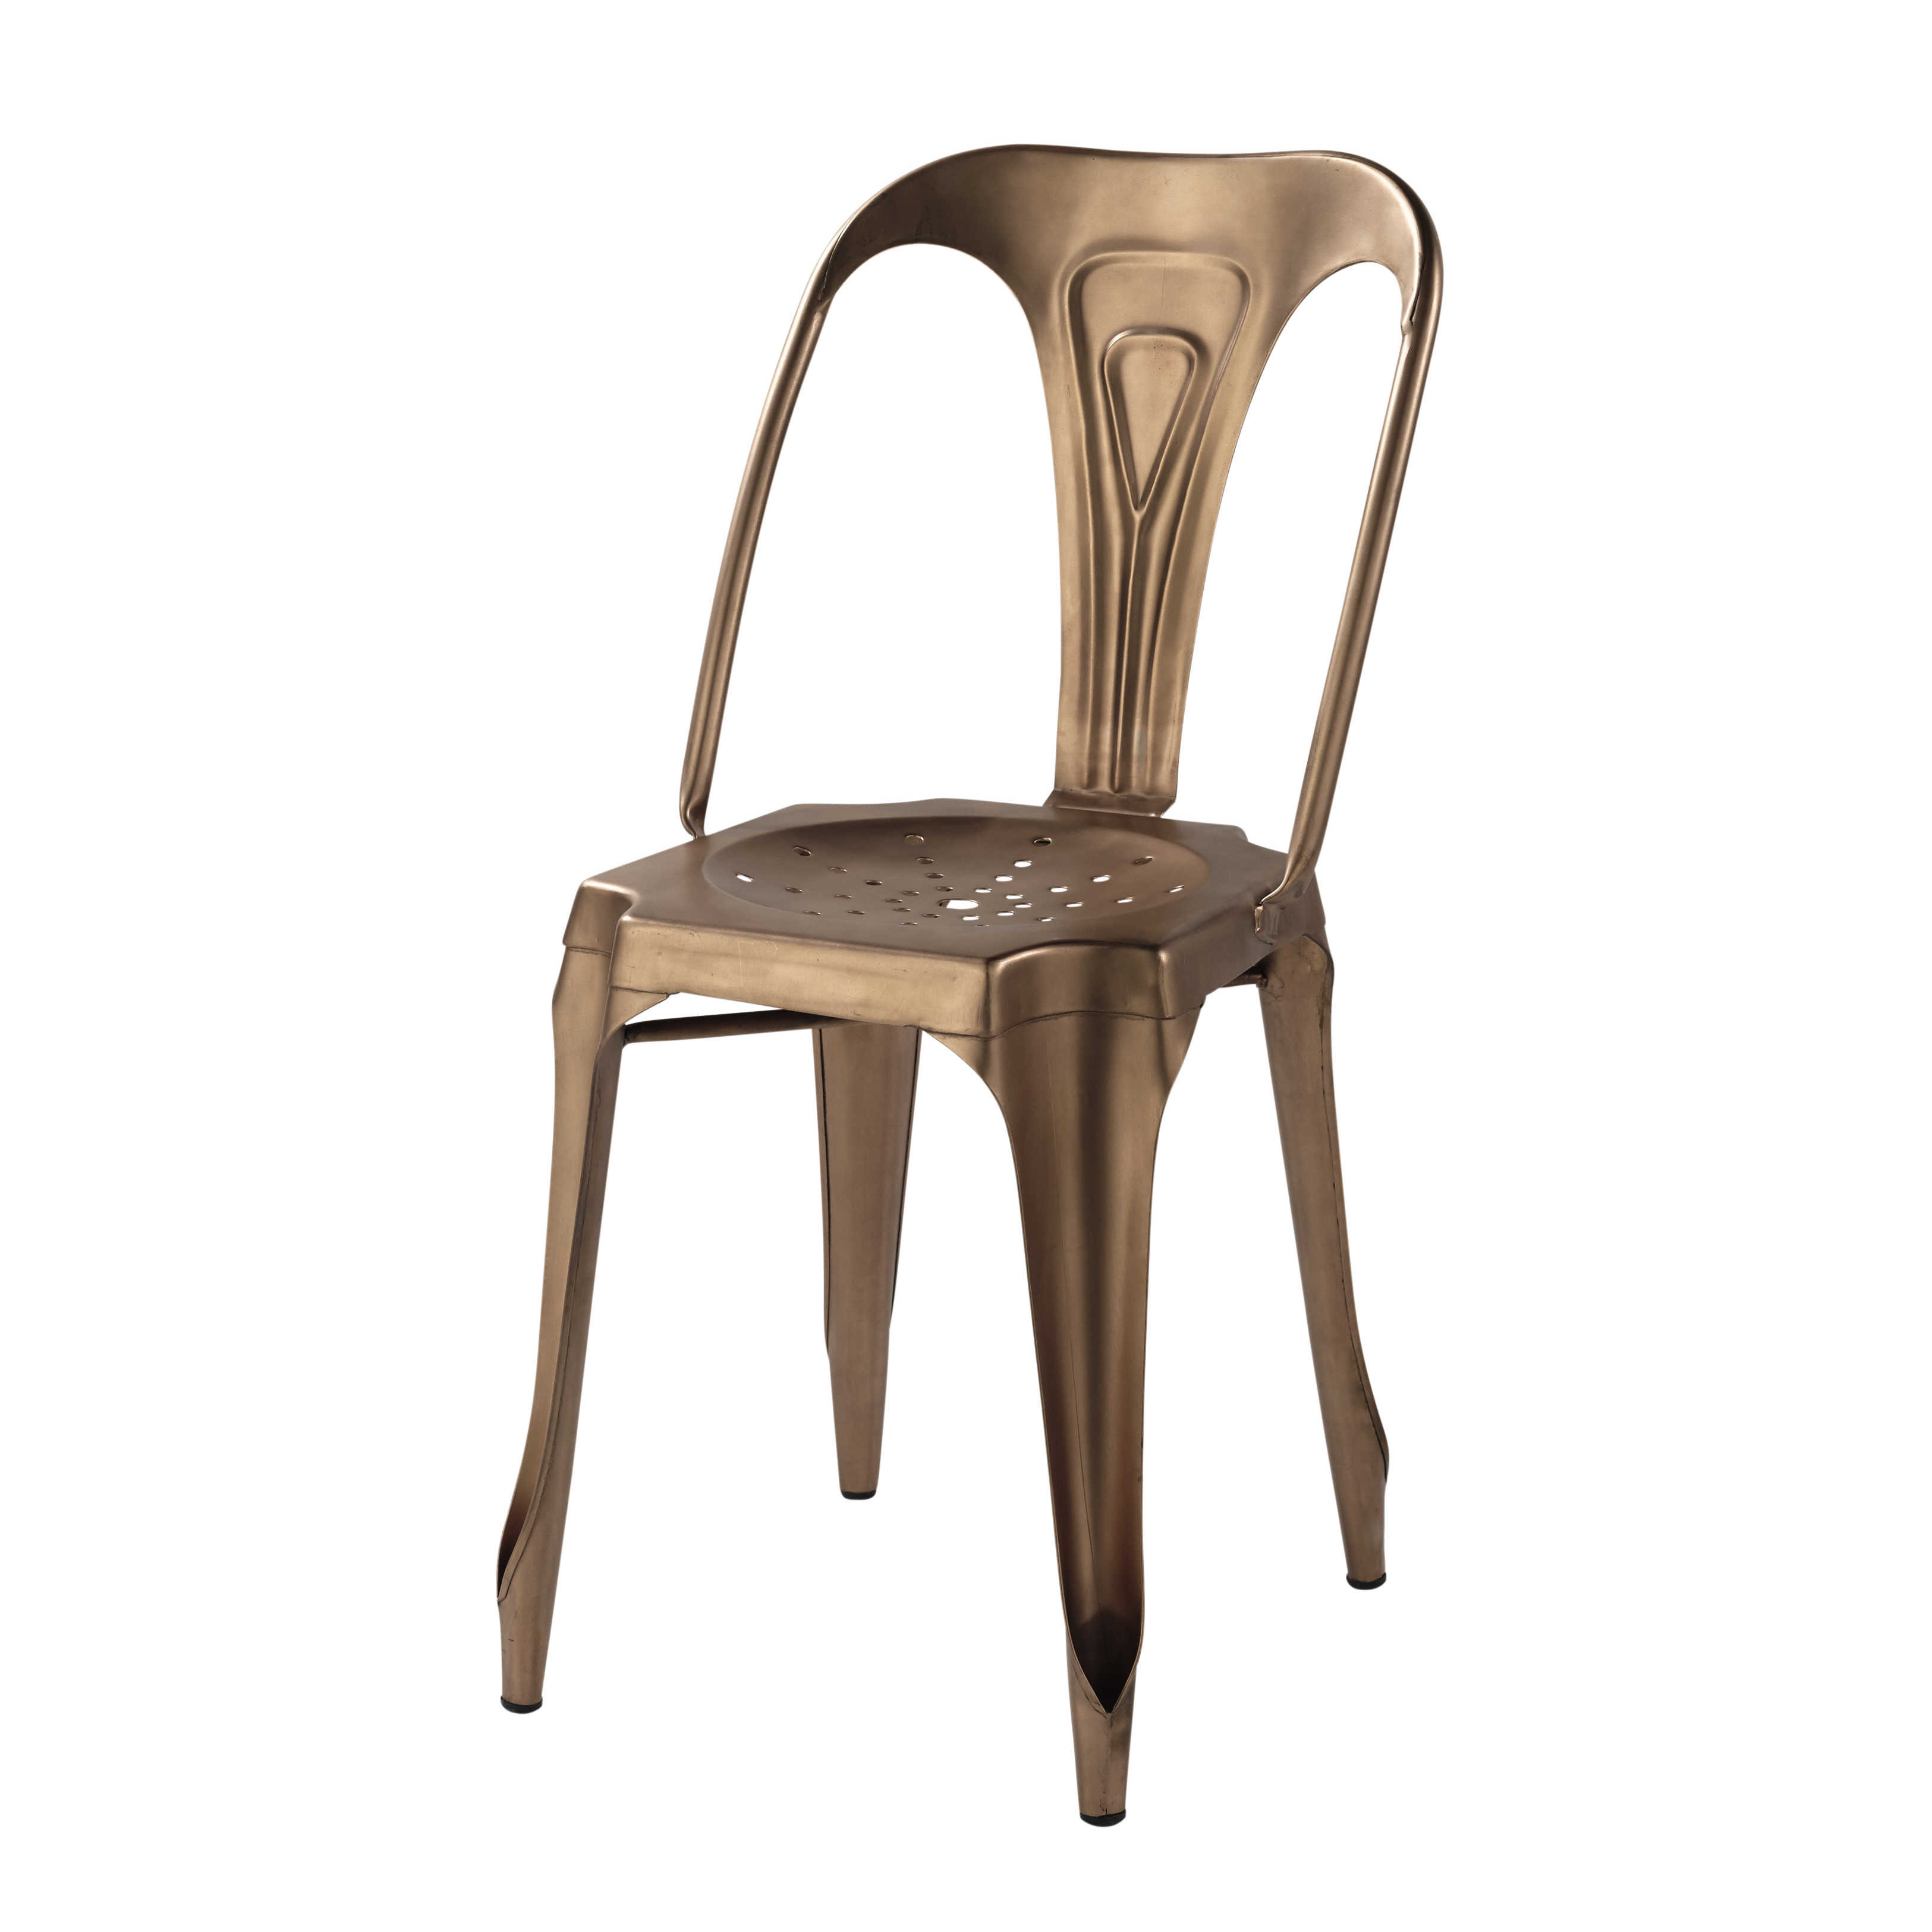 Chaise en m tal style vintage industriel demeure et jardin - Chaise type industriel ...